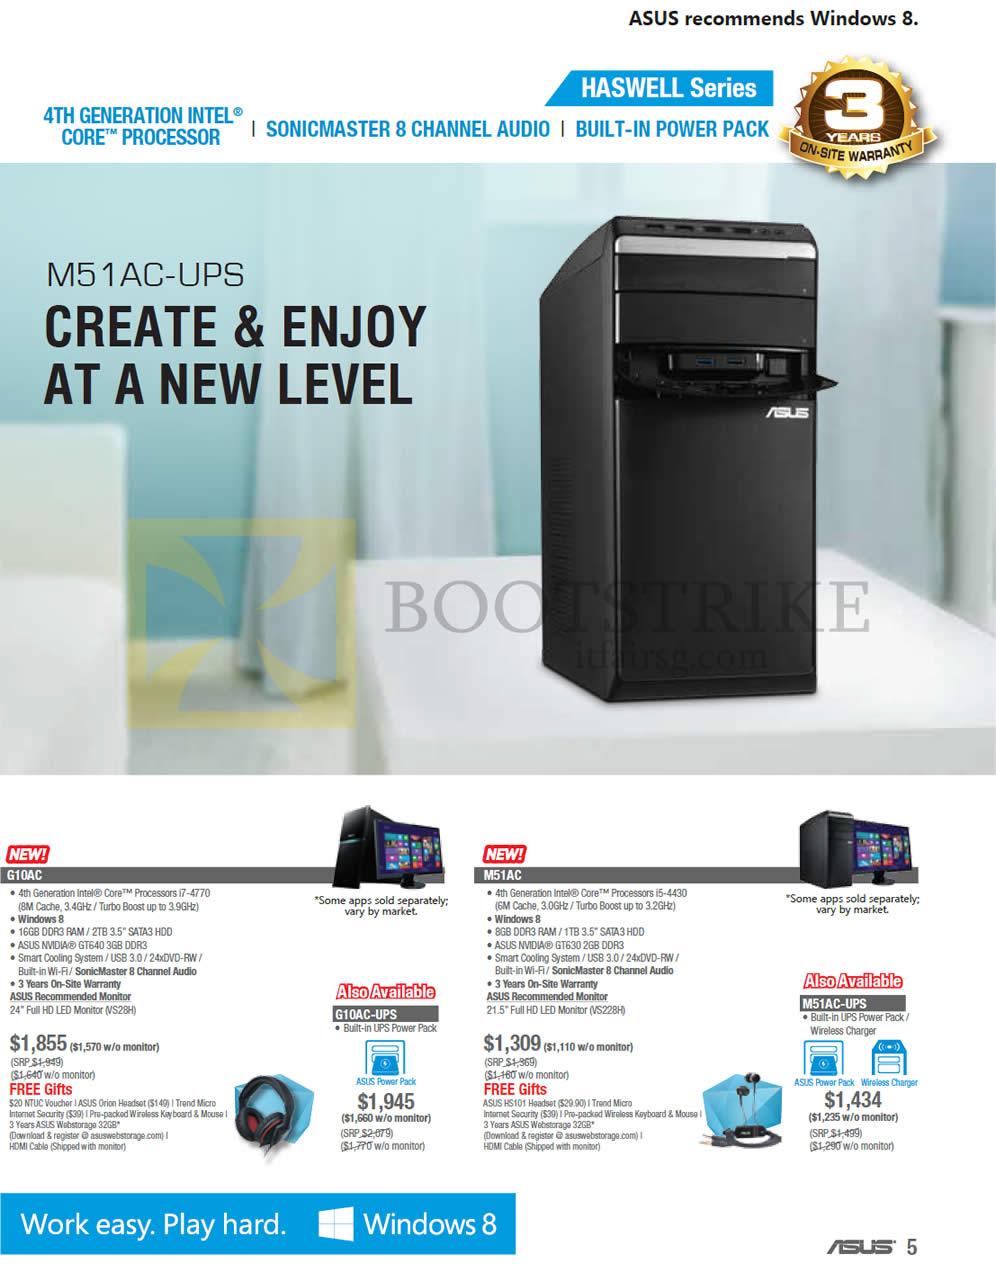 COMEX 2013 price list image brochure of ASUS Desktop PCs Haswell Series G10AC, M51AC, M51AC-UPS